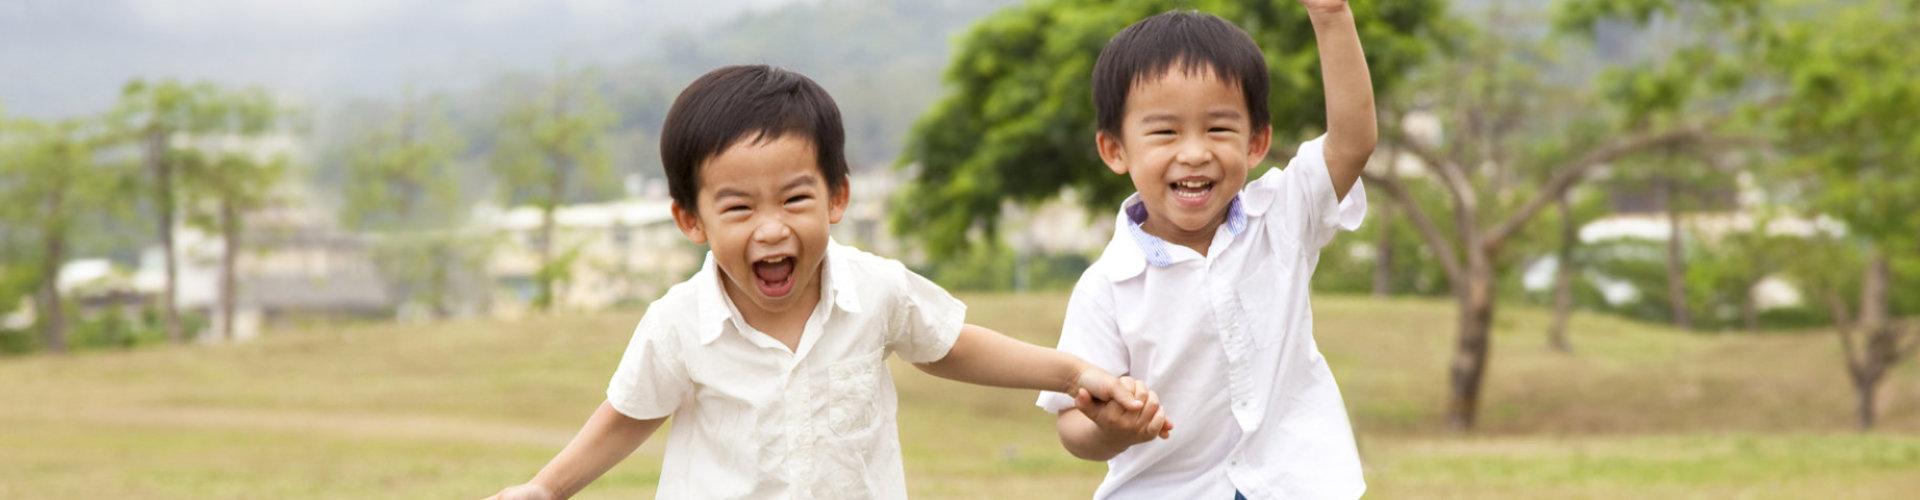 children running outdoor